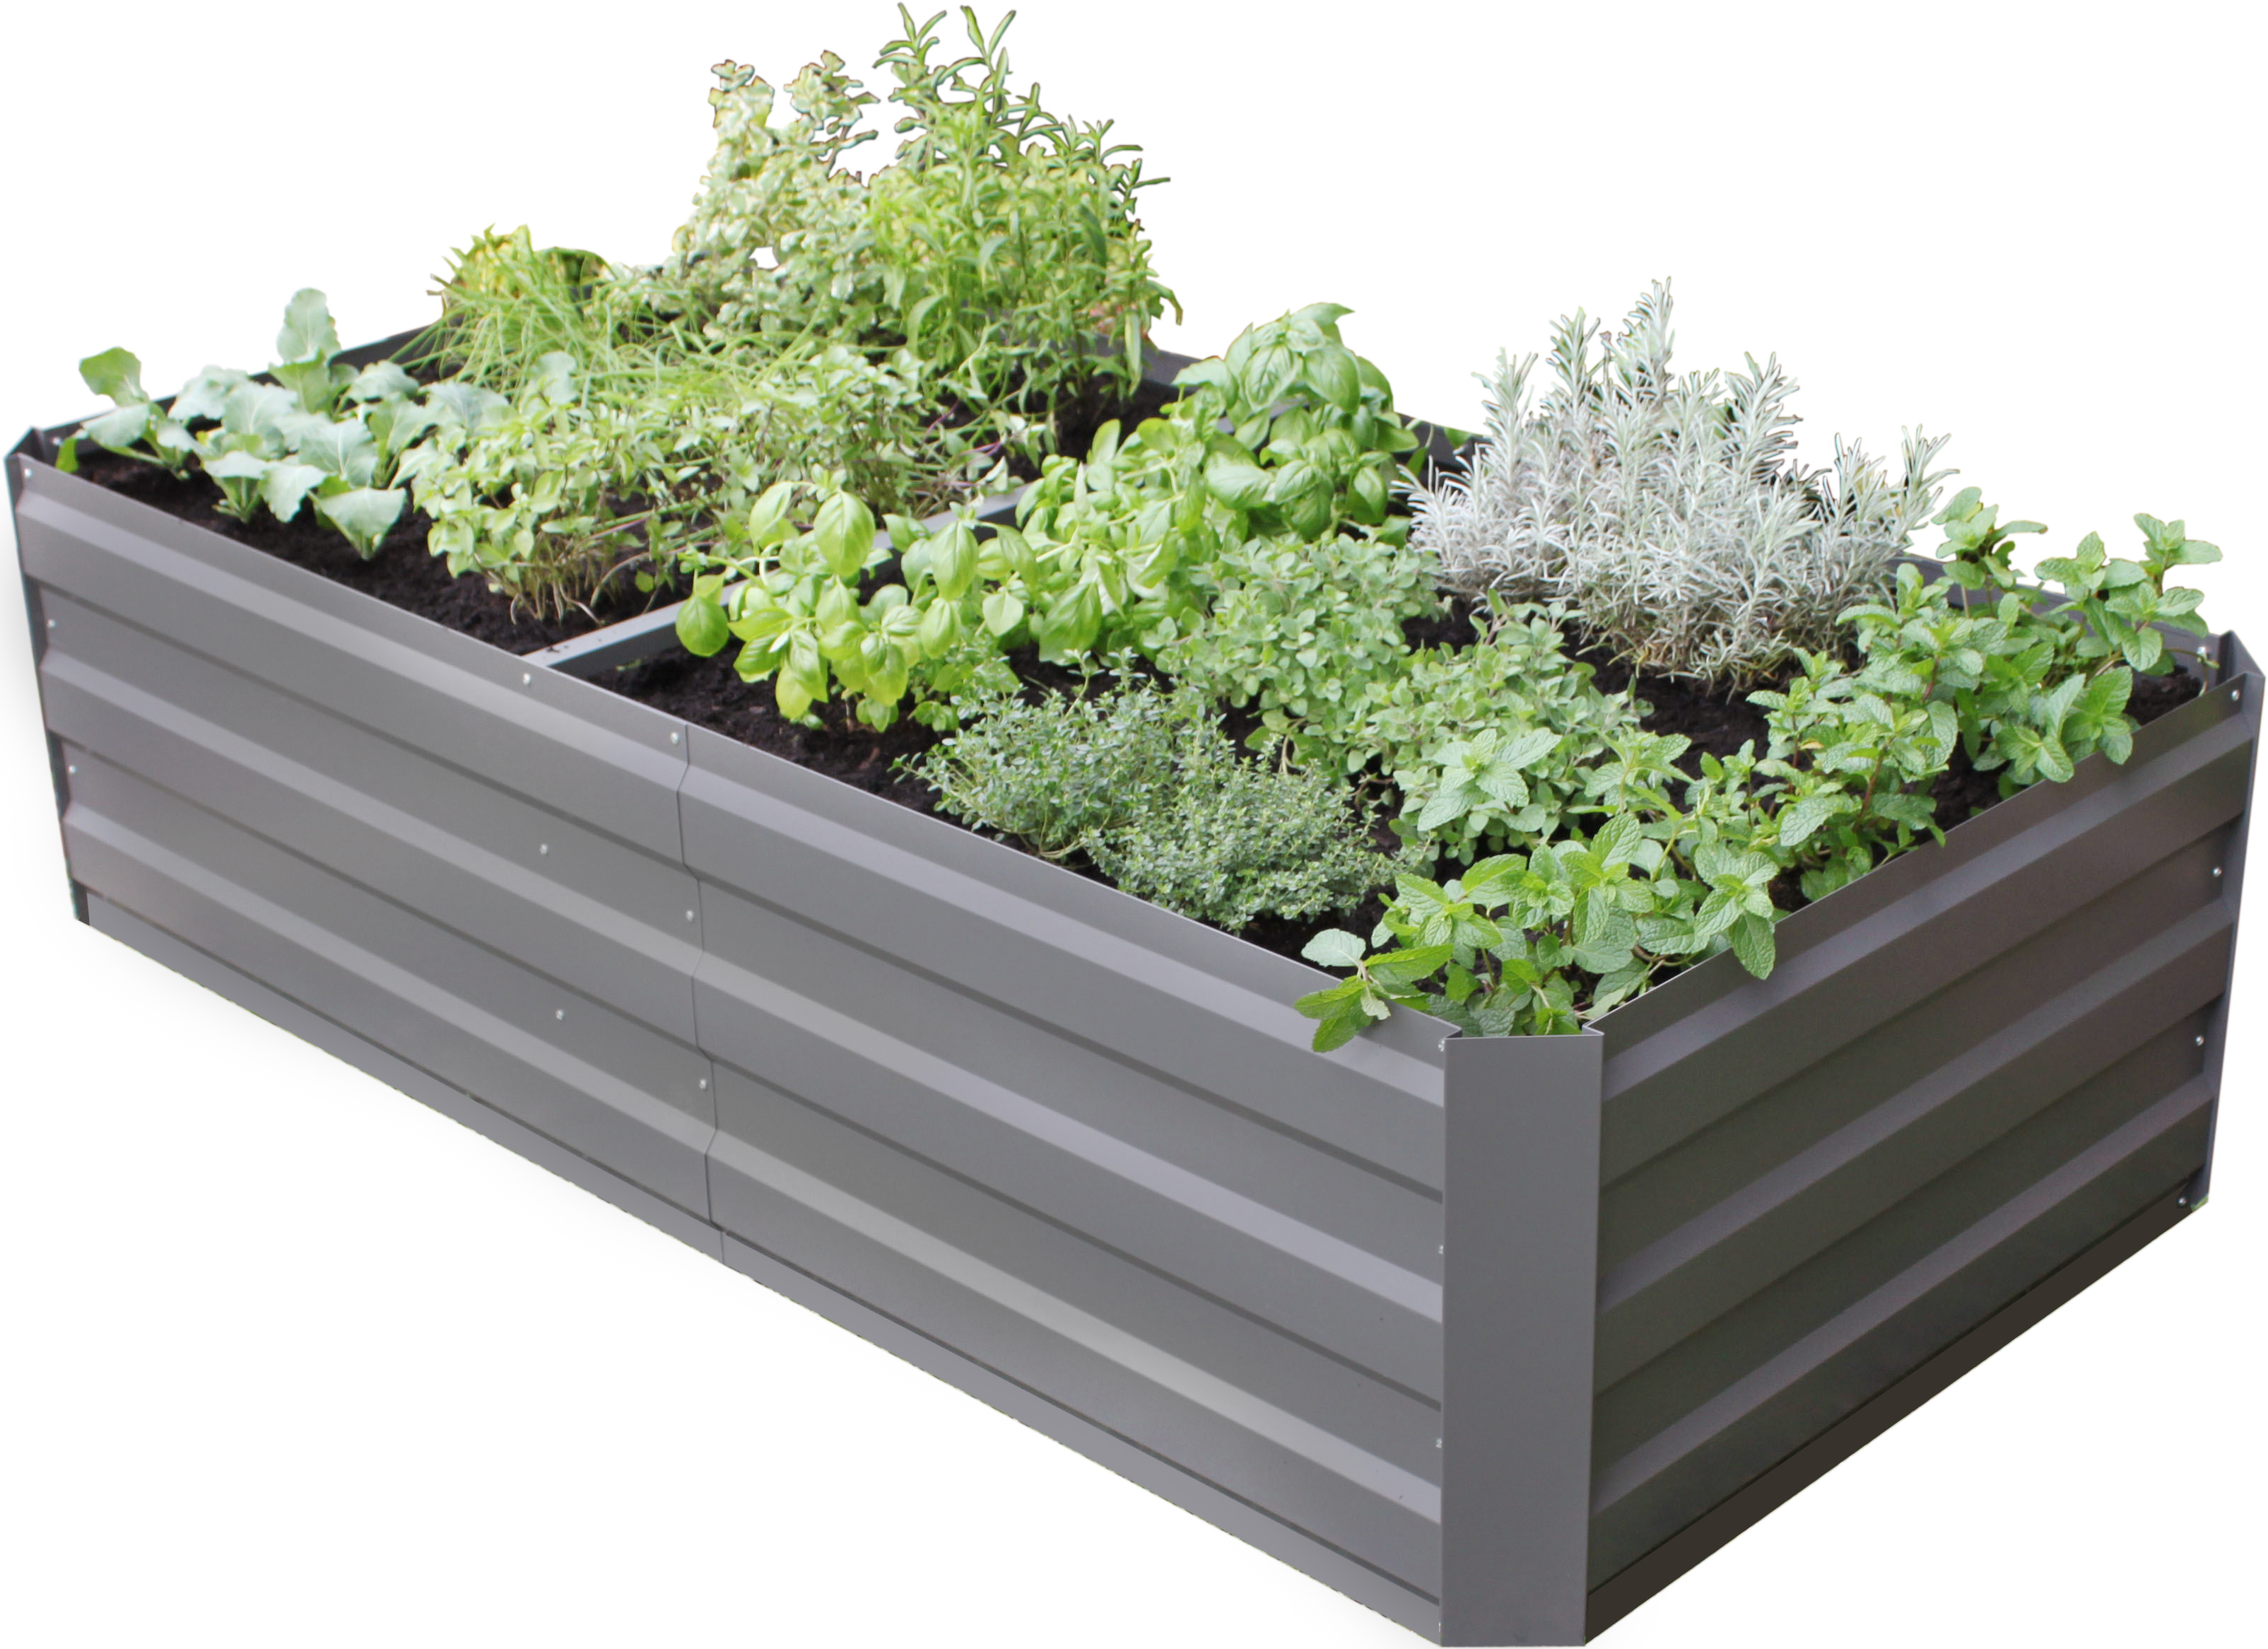 Gardenlife - Easy Raised Bed 90 x 180 cm - Large (131662)